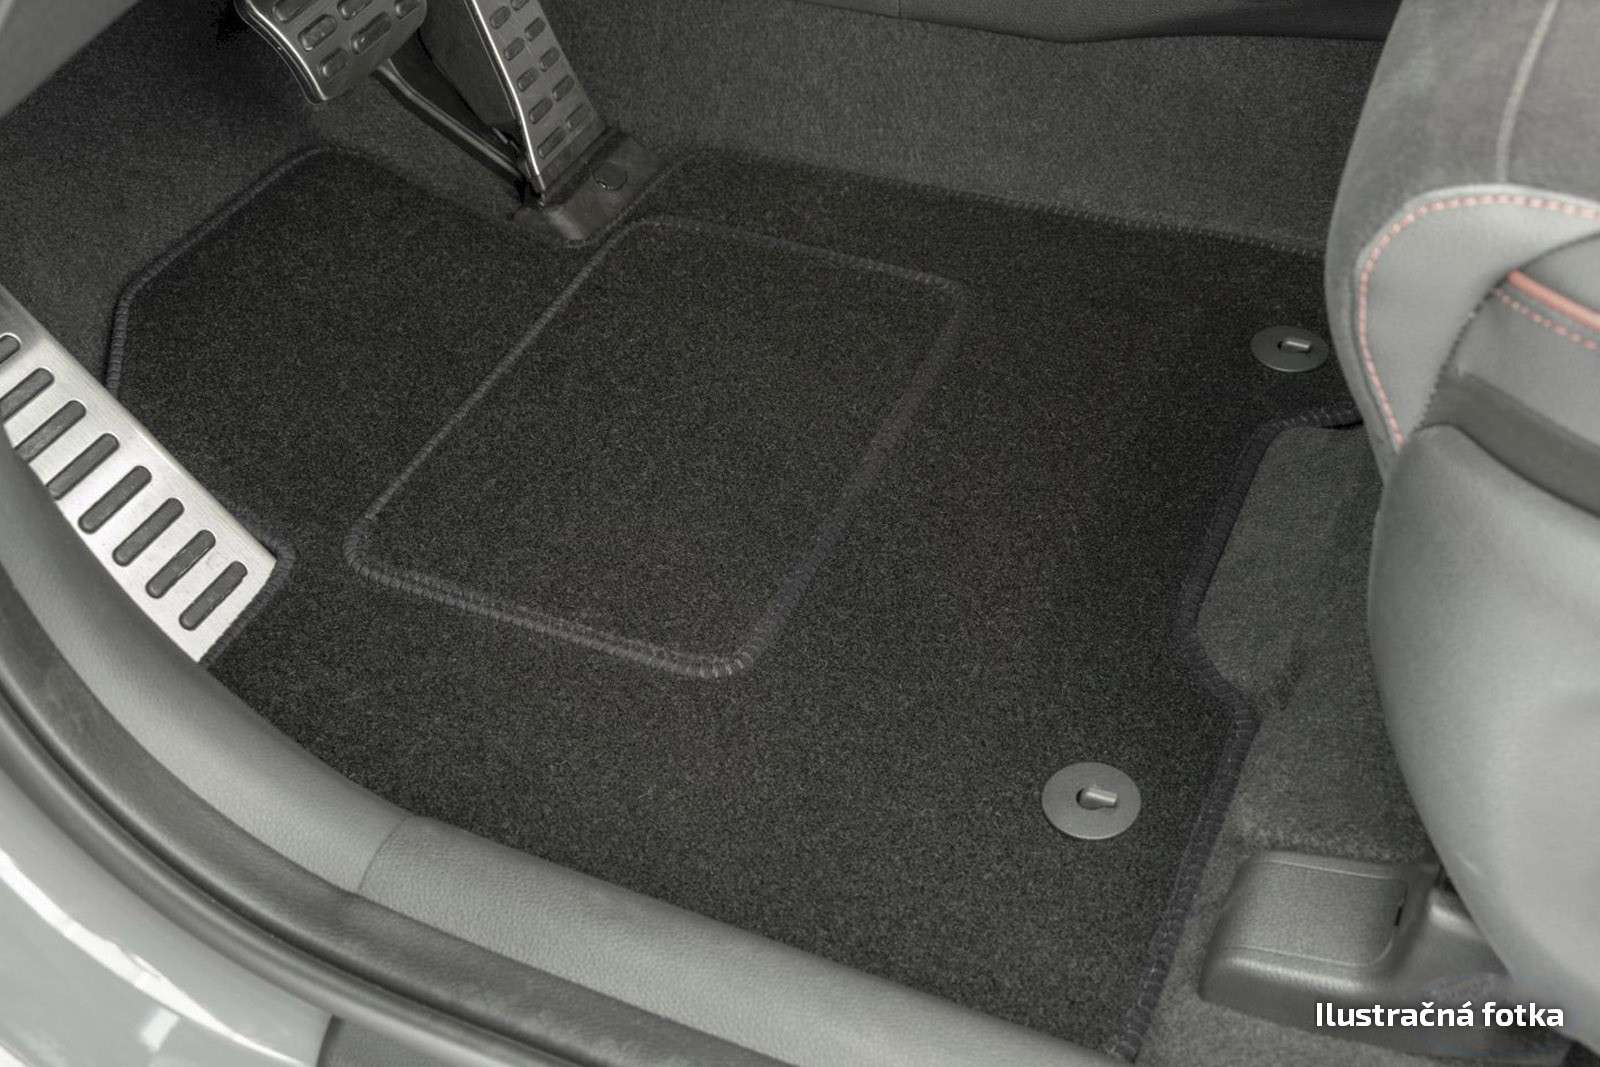 Poza cu Covorase din velur, Volkswagen Passat (B5), 2001-2005